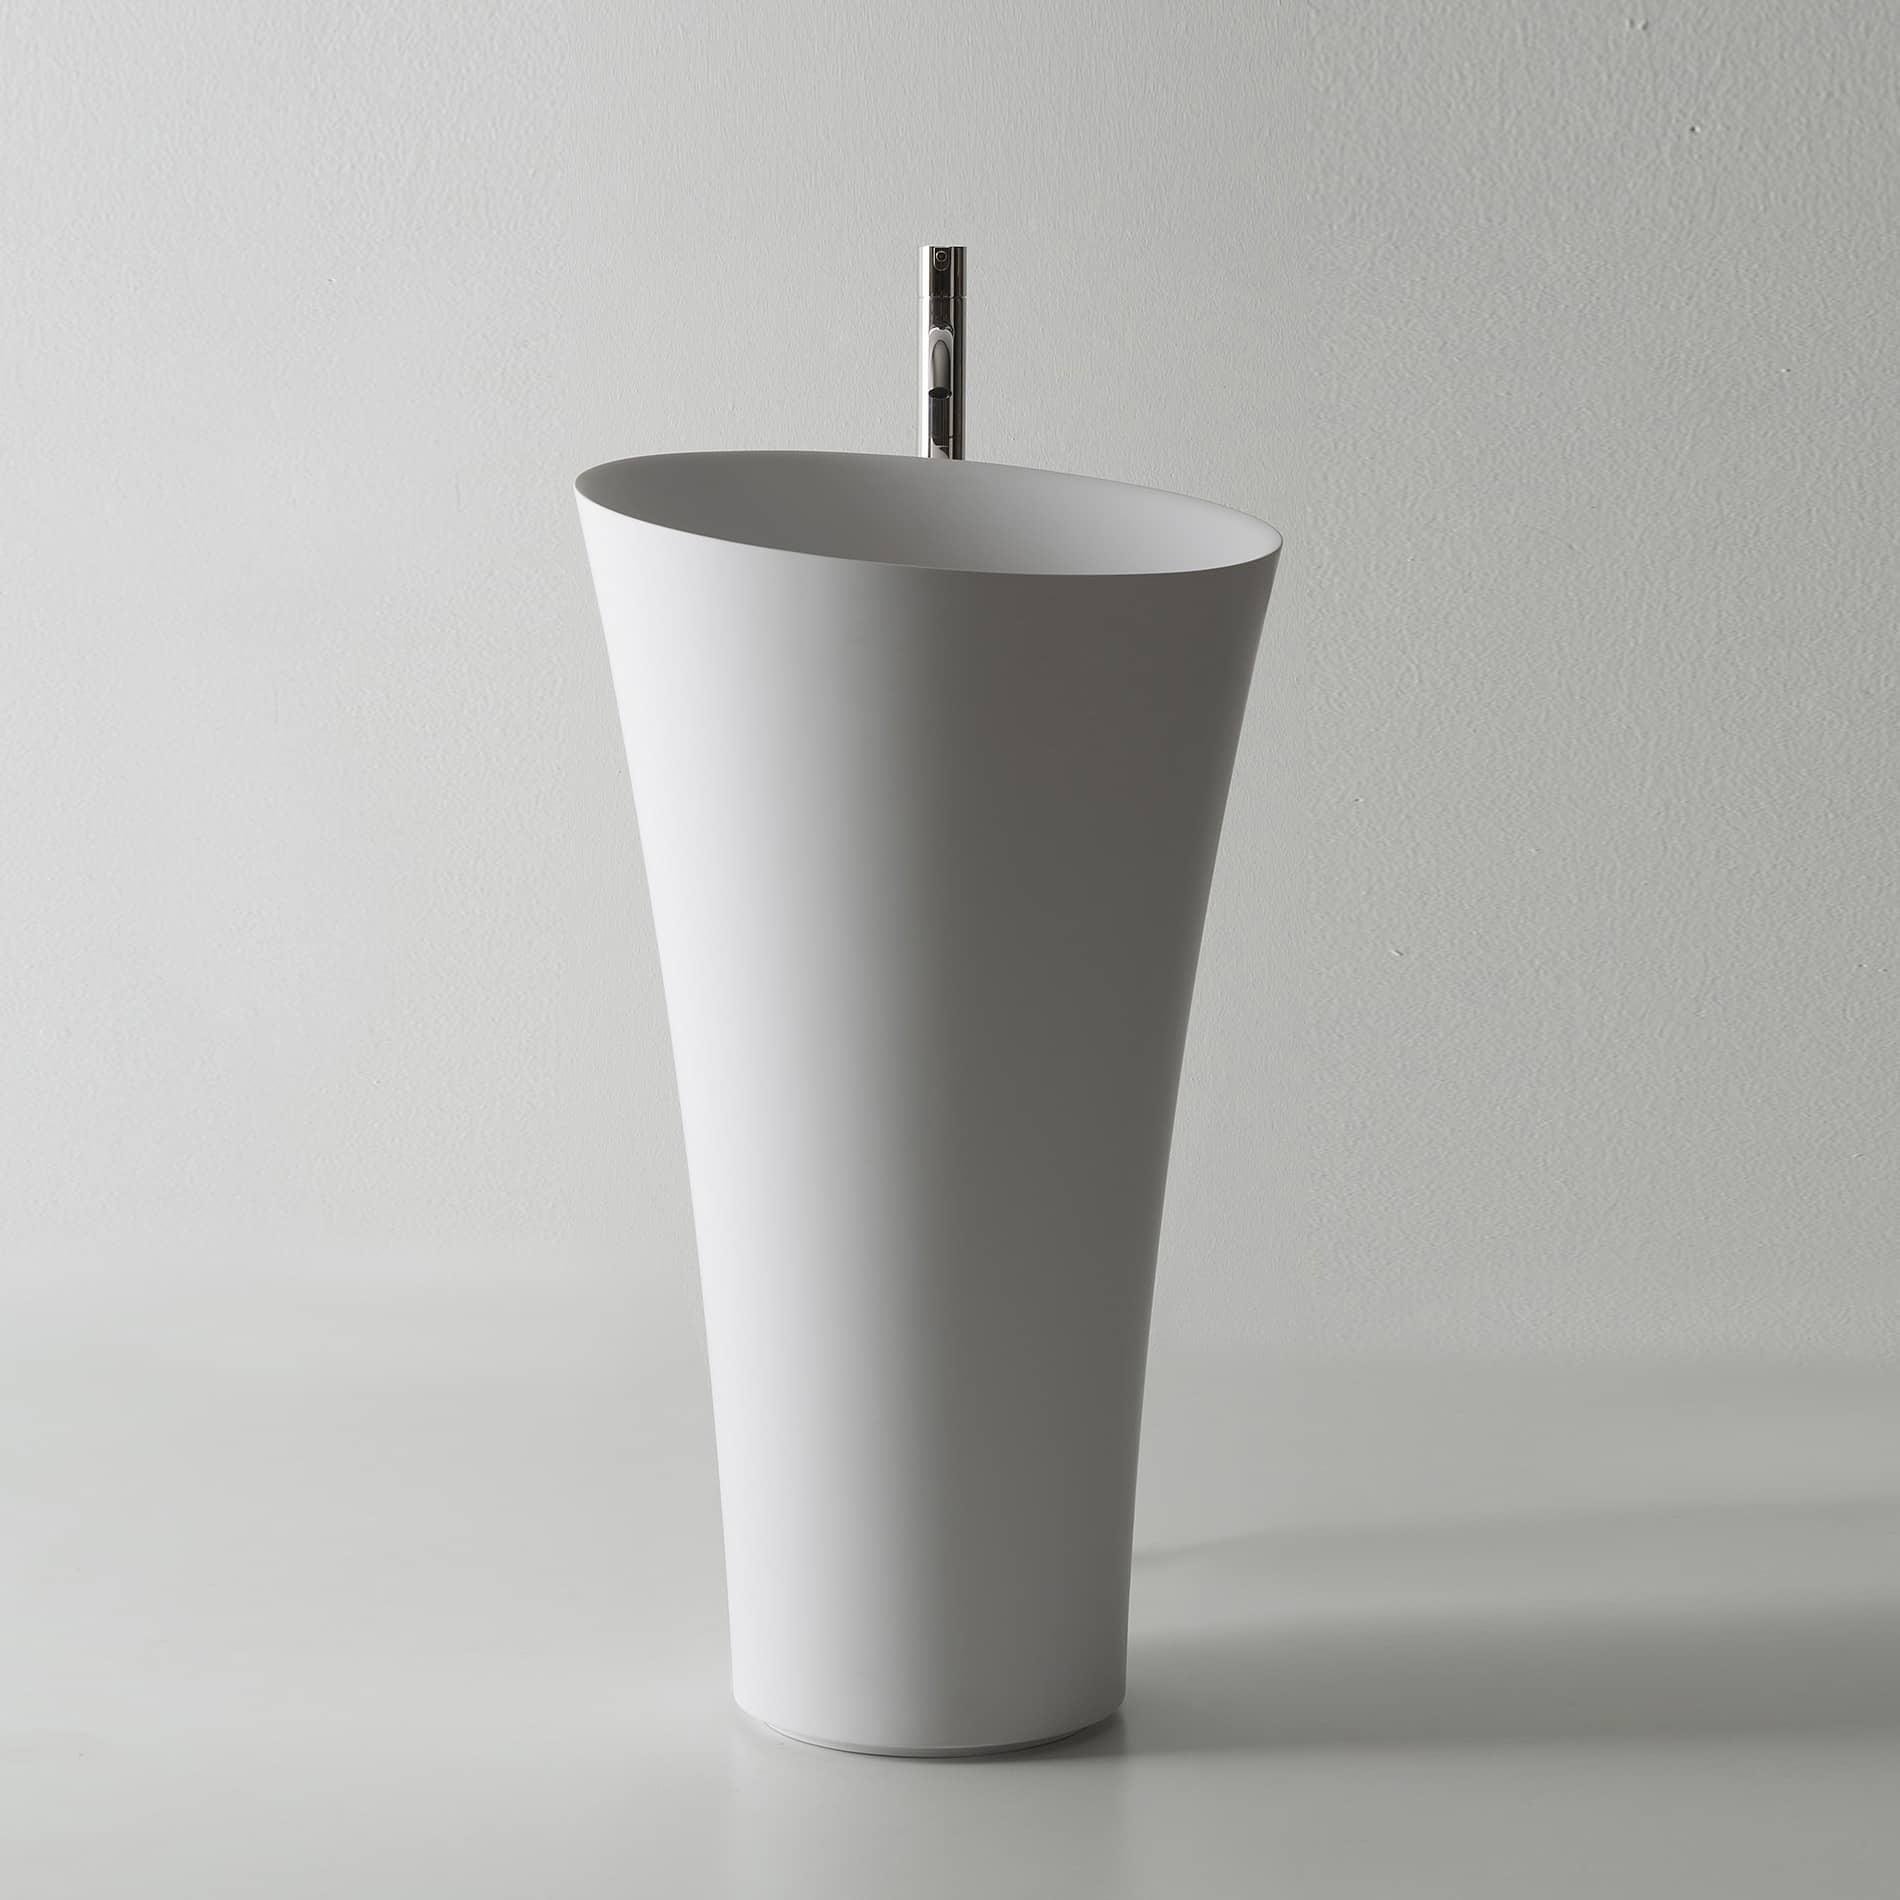 Cristalplant-products-Antoniolupi-washbasins-1